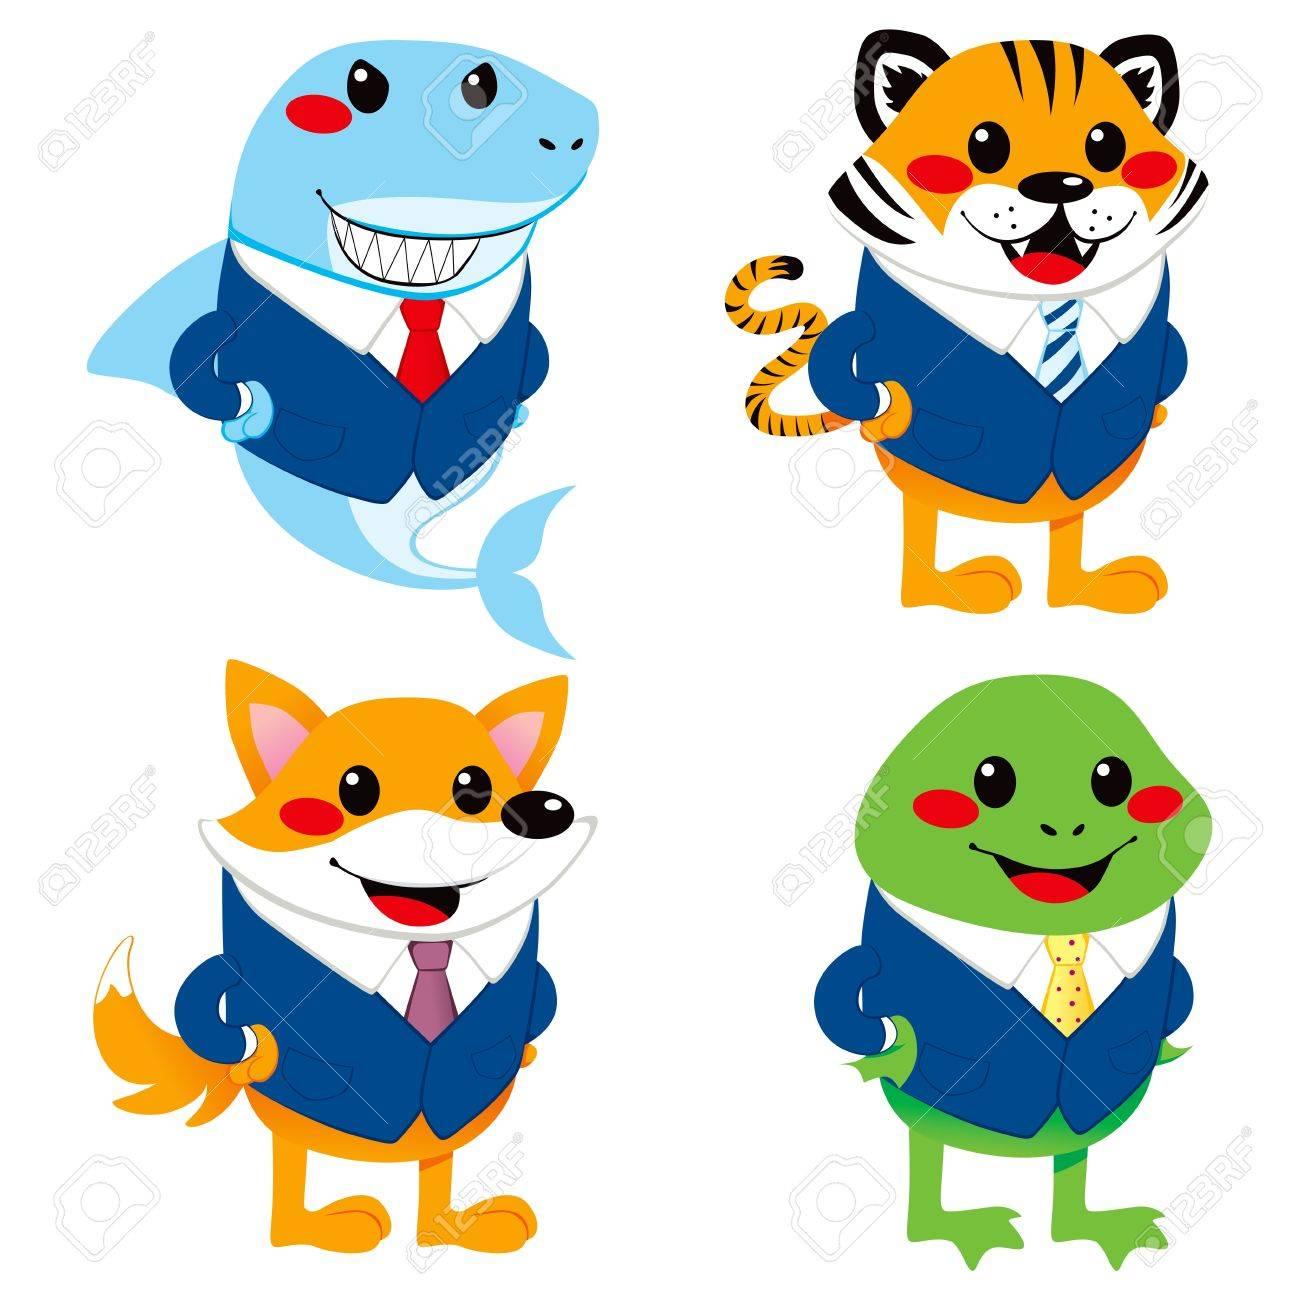 Cute Animal Characters